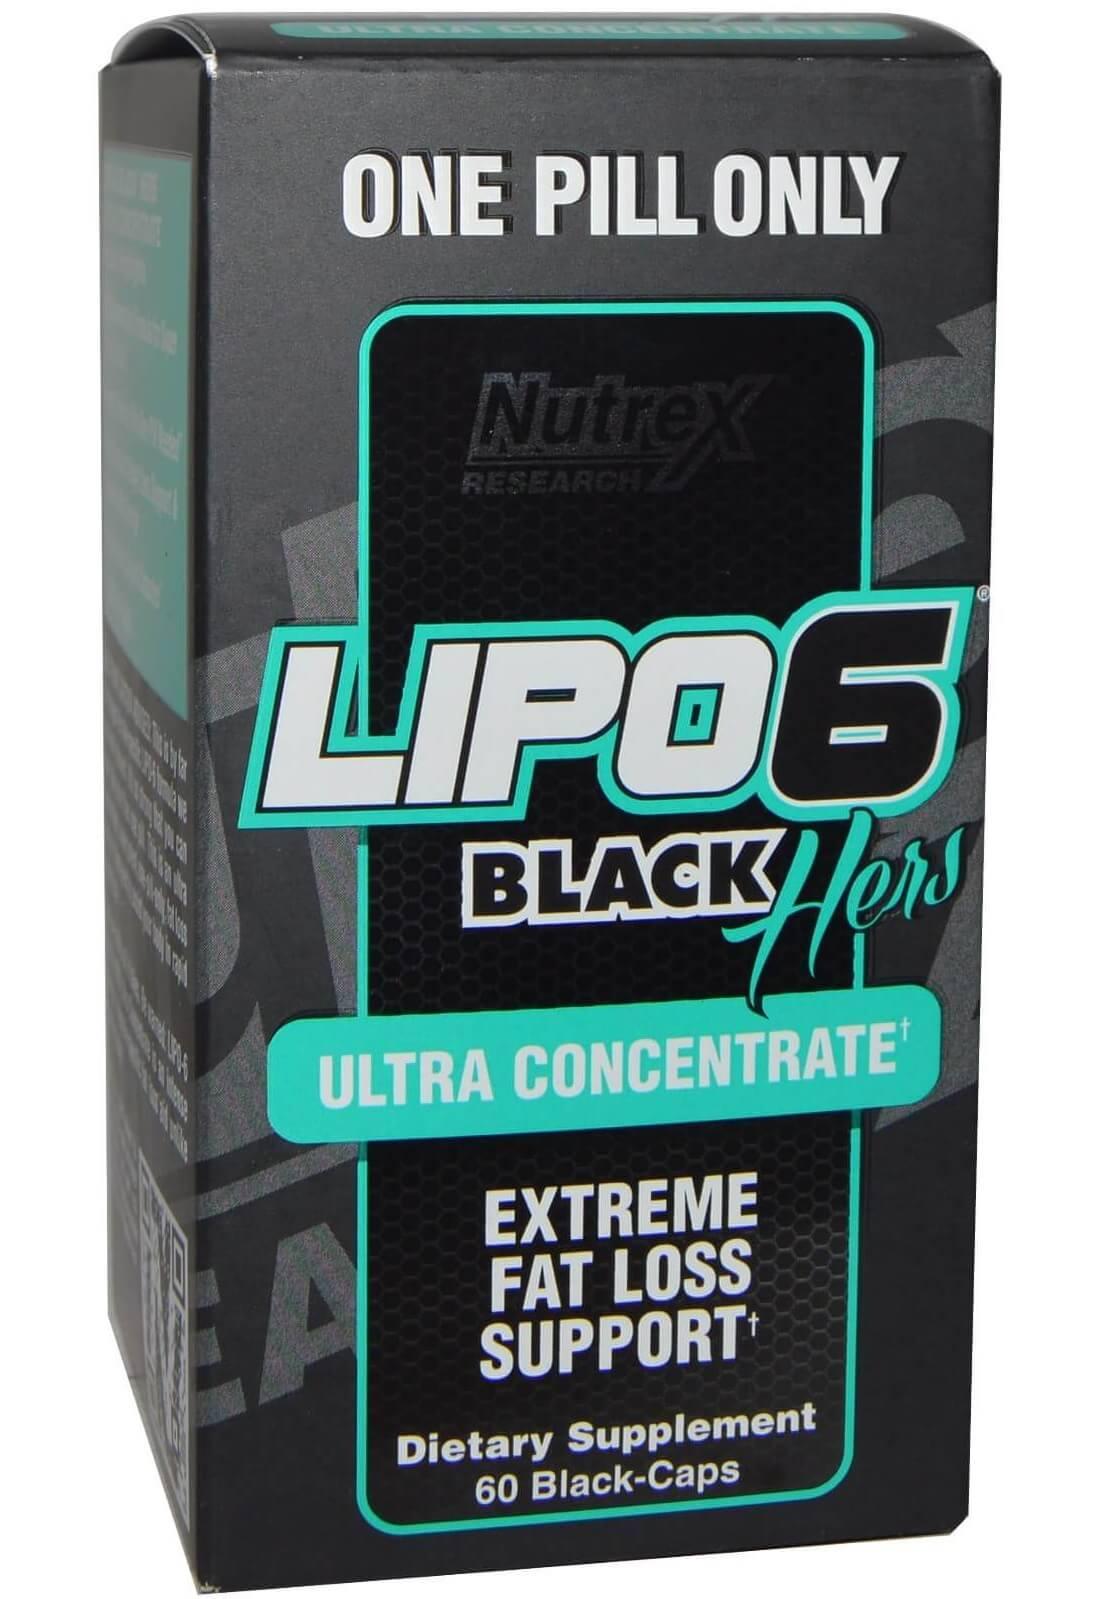 Lipo 6 Black Hers Ultra Concentrate (IMPORTADO) - 60 caps